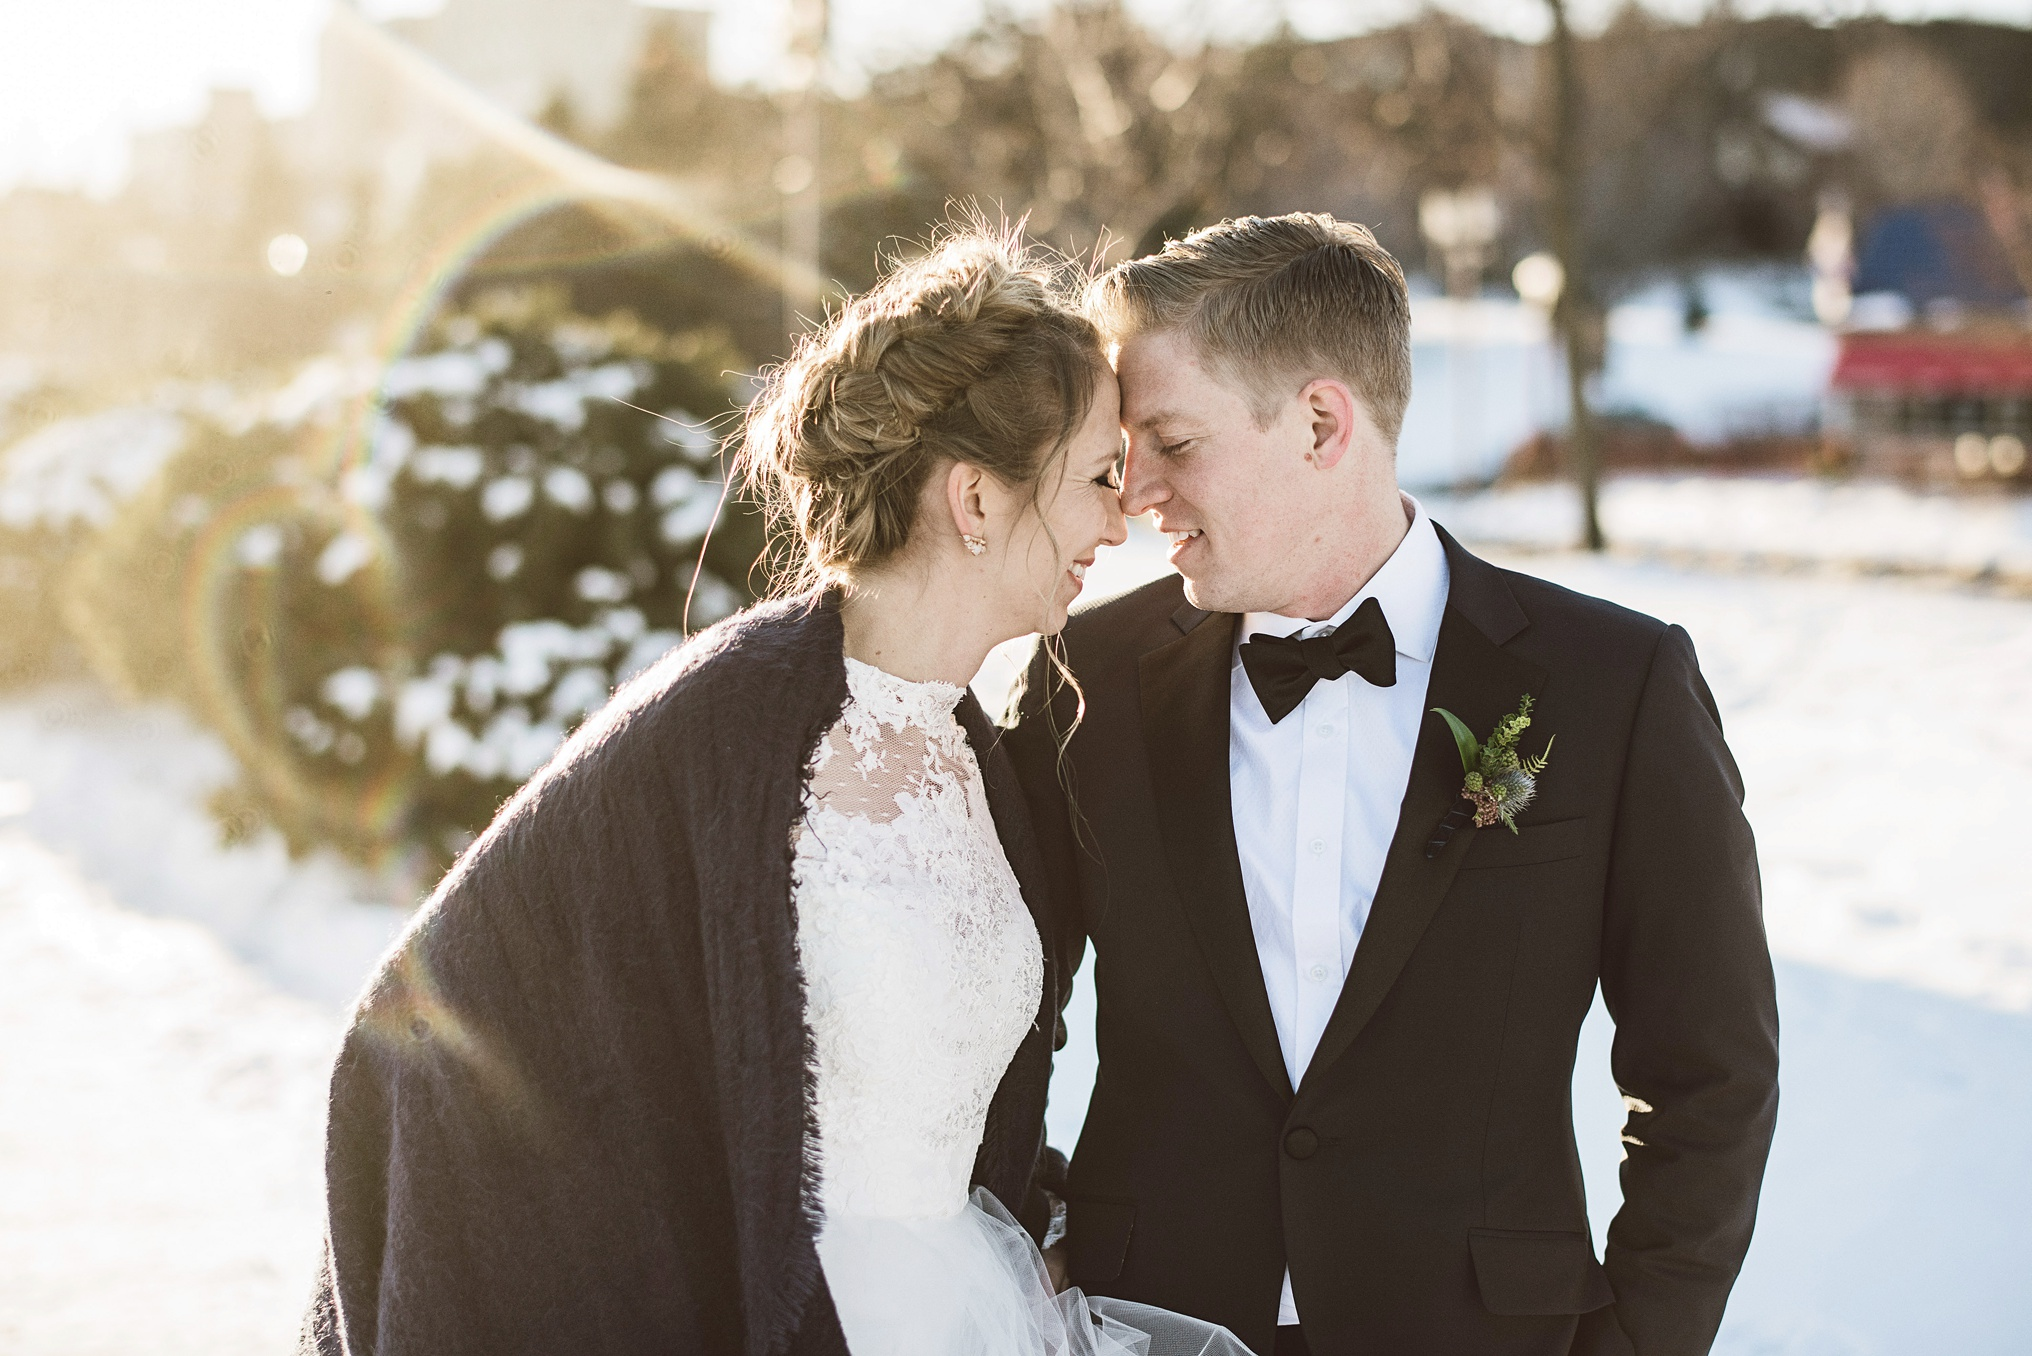 best_wedding_photography_2017_by_lucas_botz_photography_180.jpg